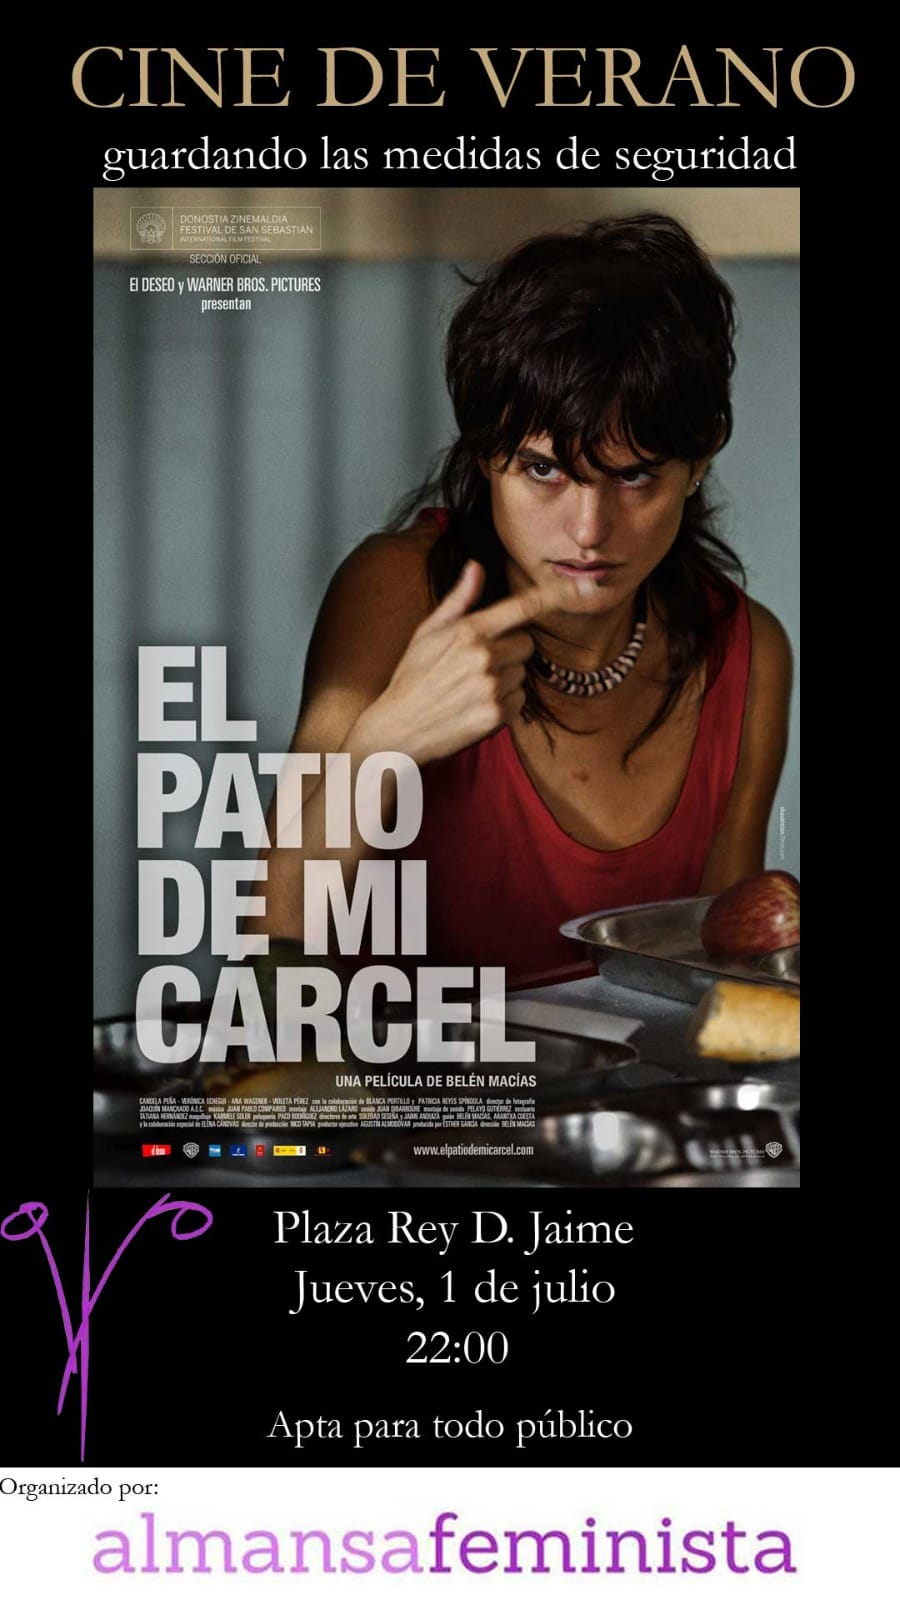 Cine de Verano, Almansa Feminista